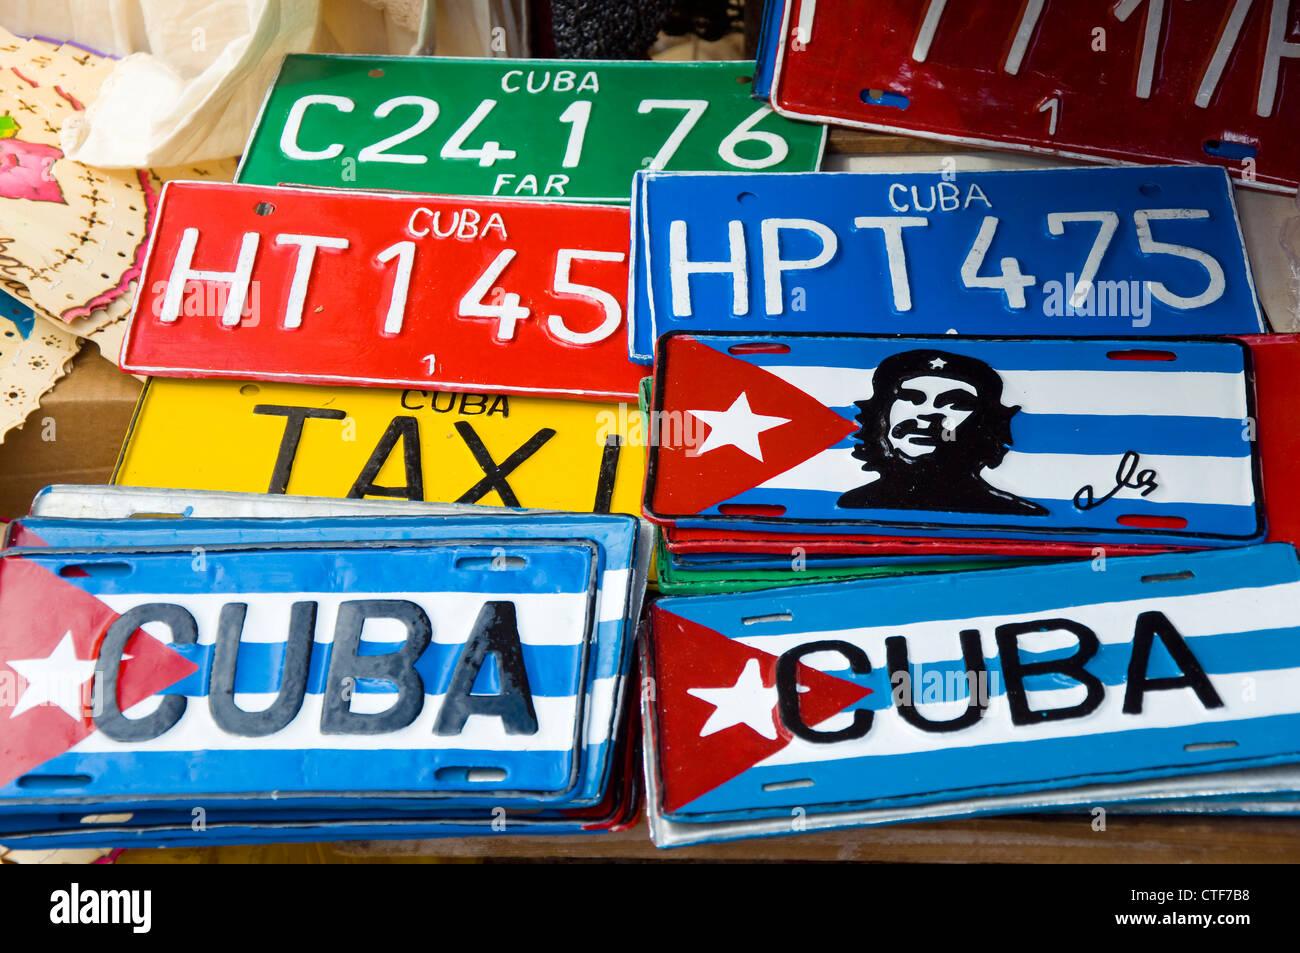 Kubanische Kfz-Kennzeichen, Trinidad, Kuba Stockbild